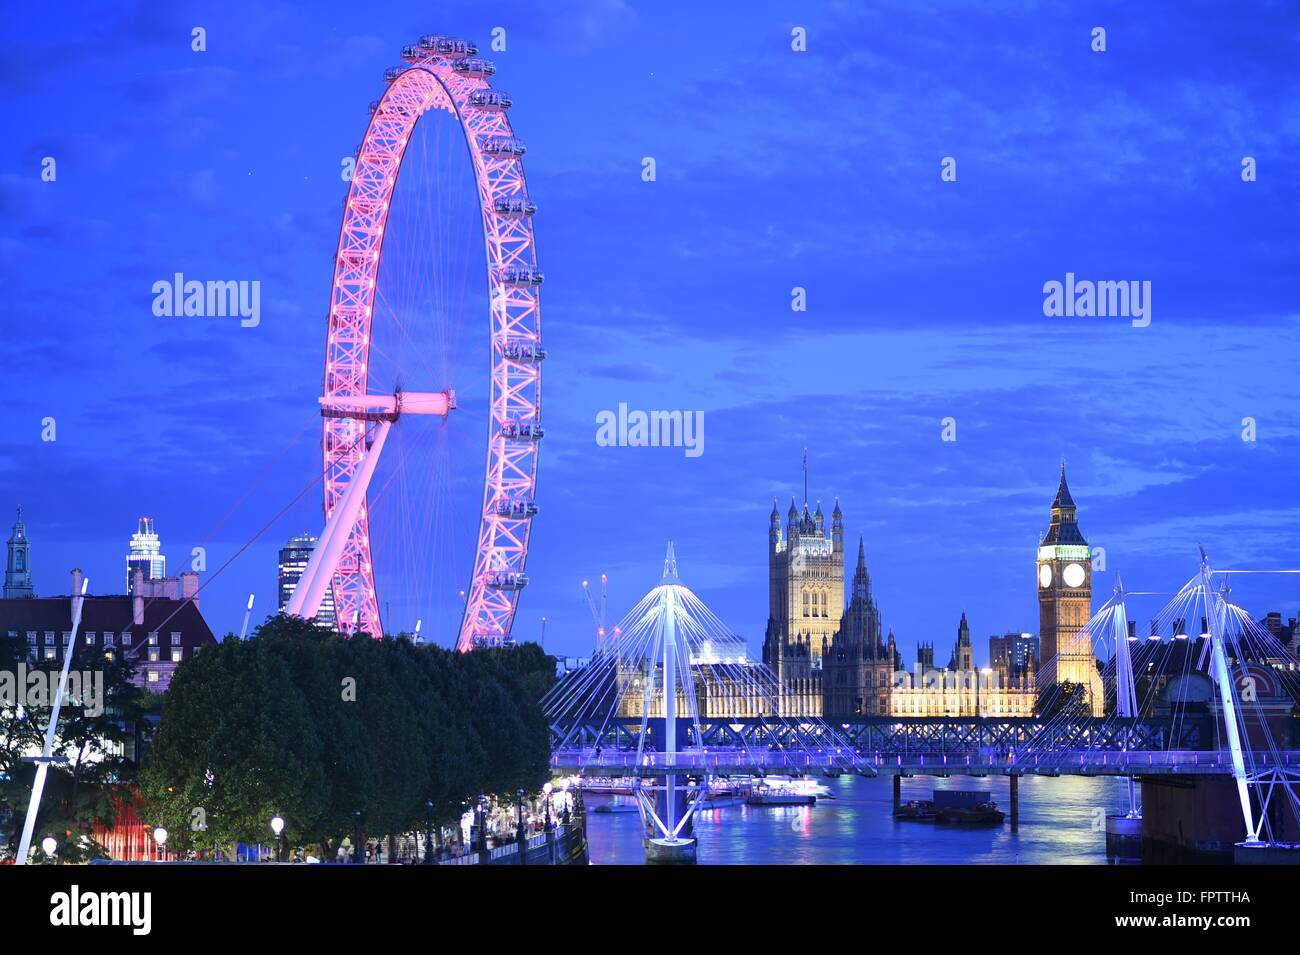 London Eye, viste a 360 gradi di Londra Immagini Stock